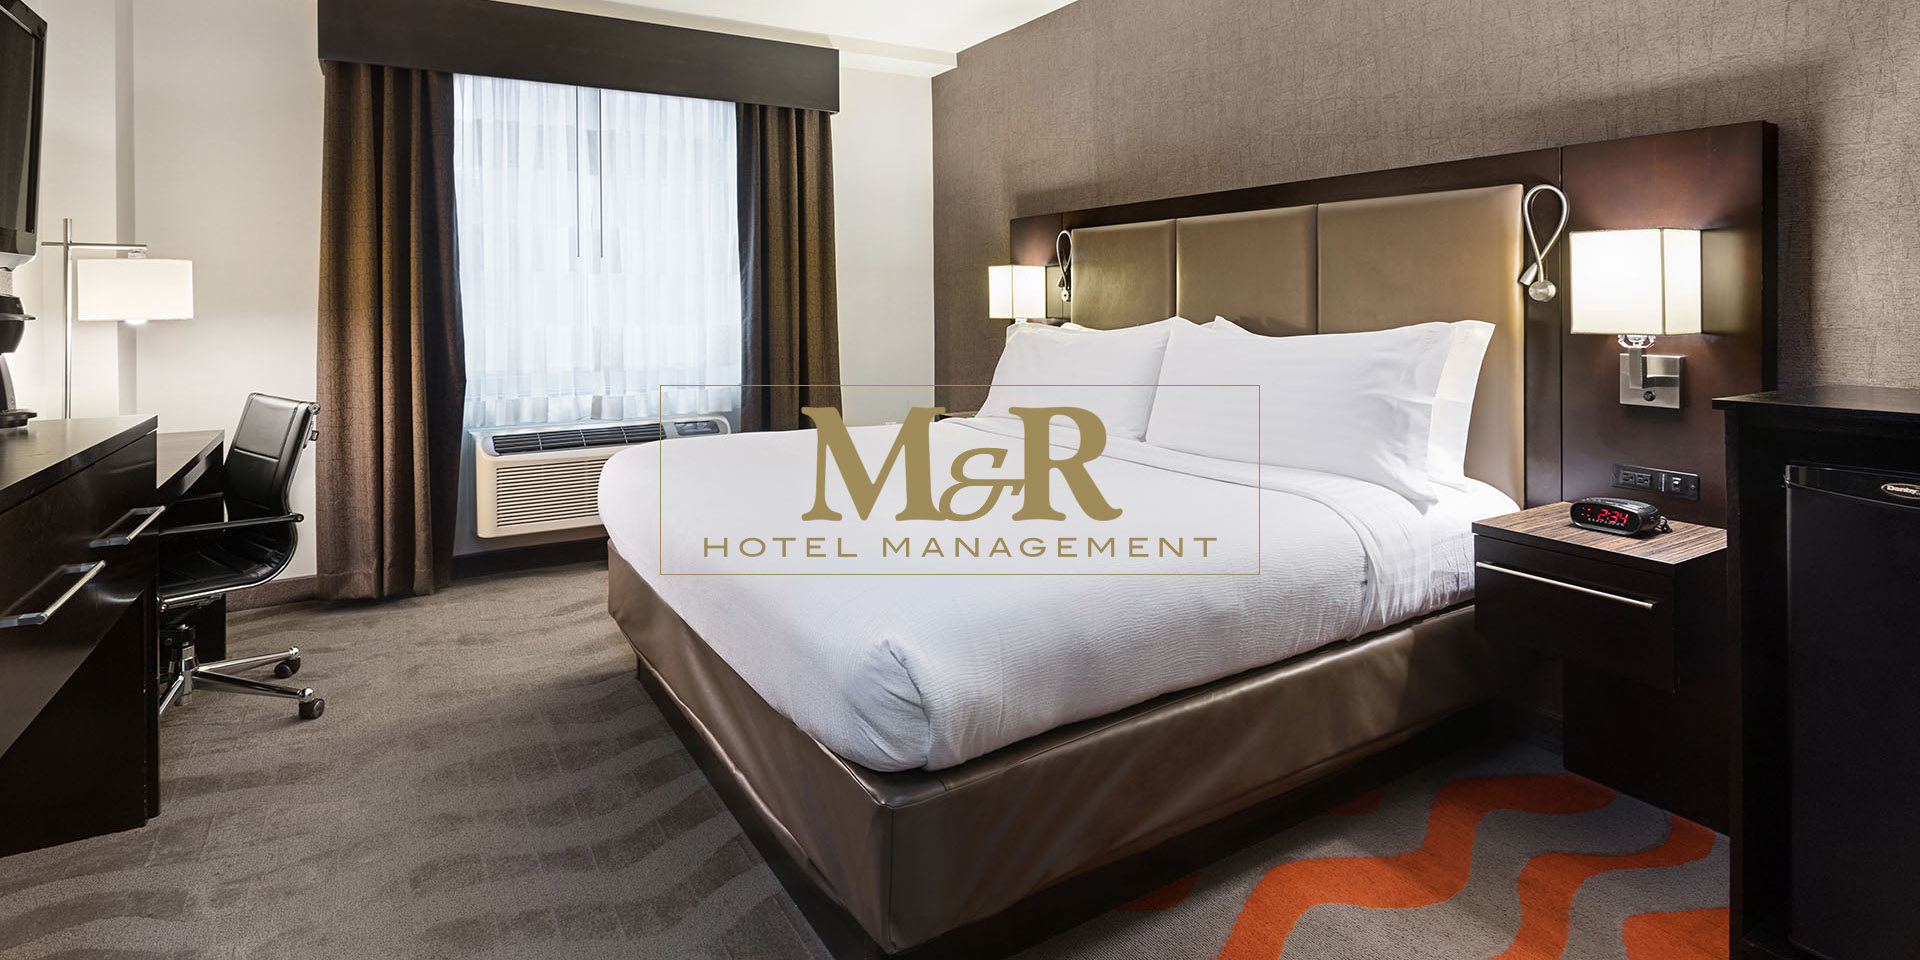 M&R Hotel Management